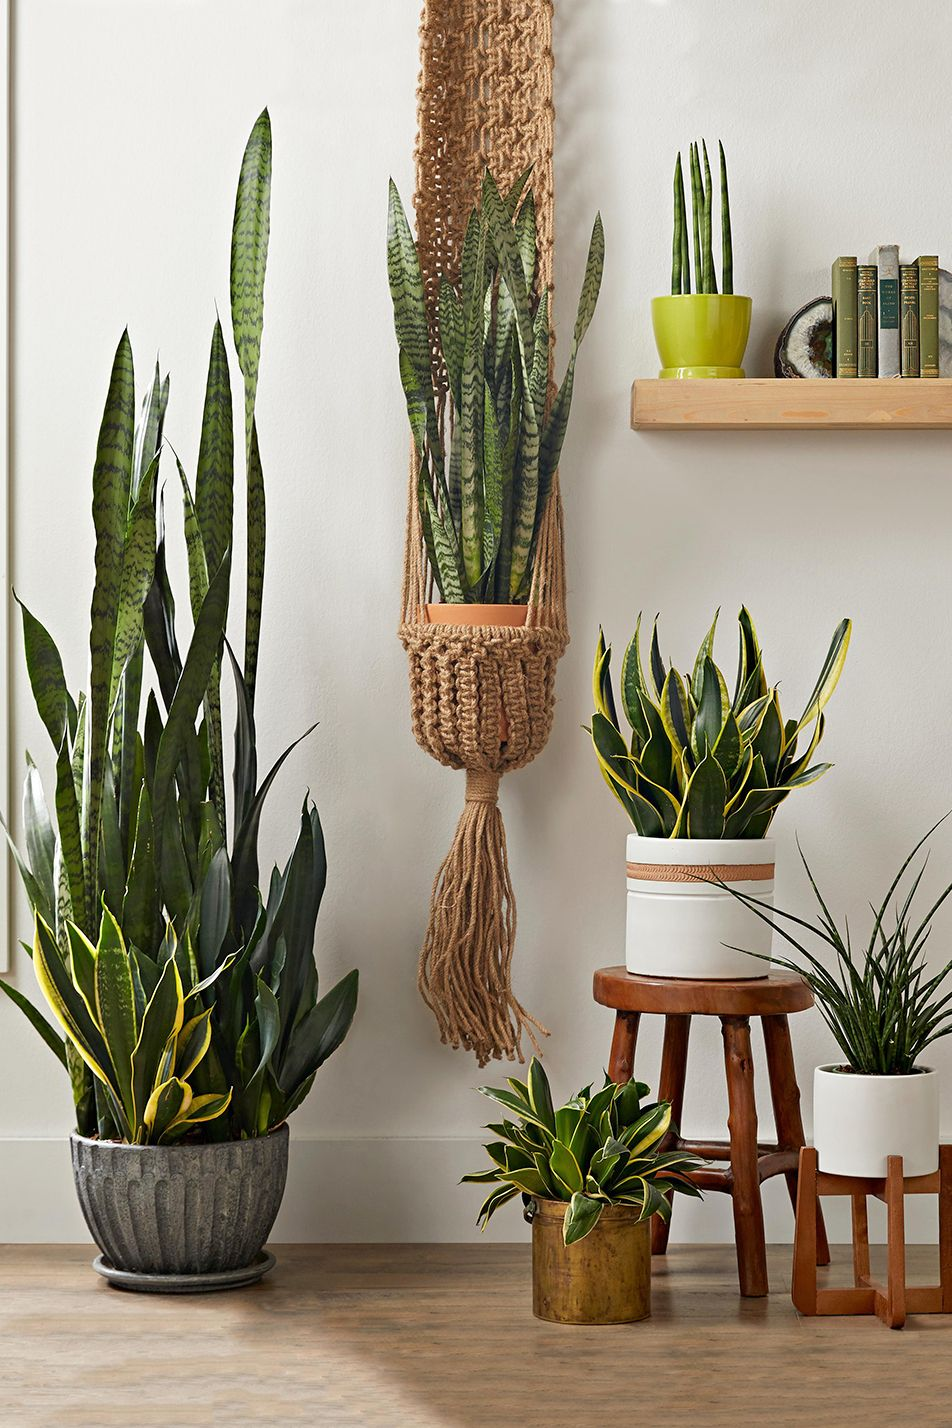 17 Drought-Tolerant Houseplants You Can't Kill -   17 planting Indoor desk ideas